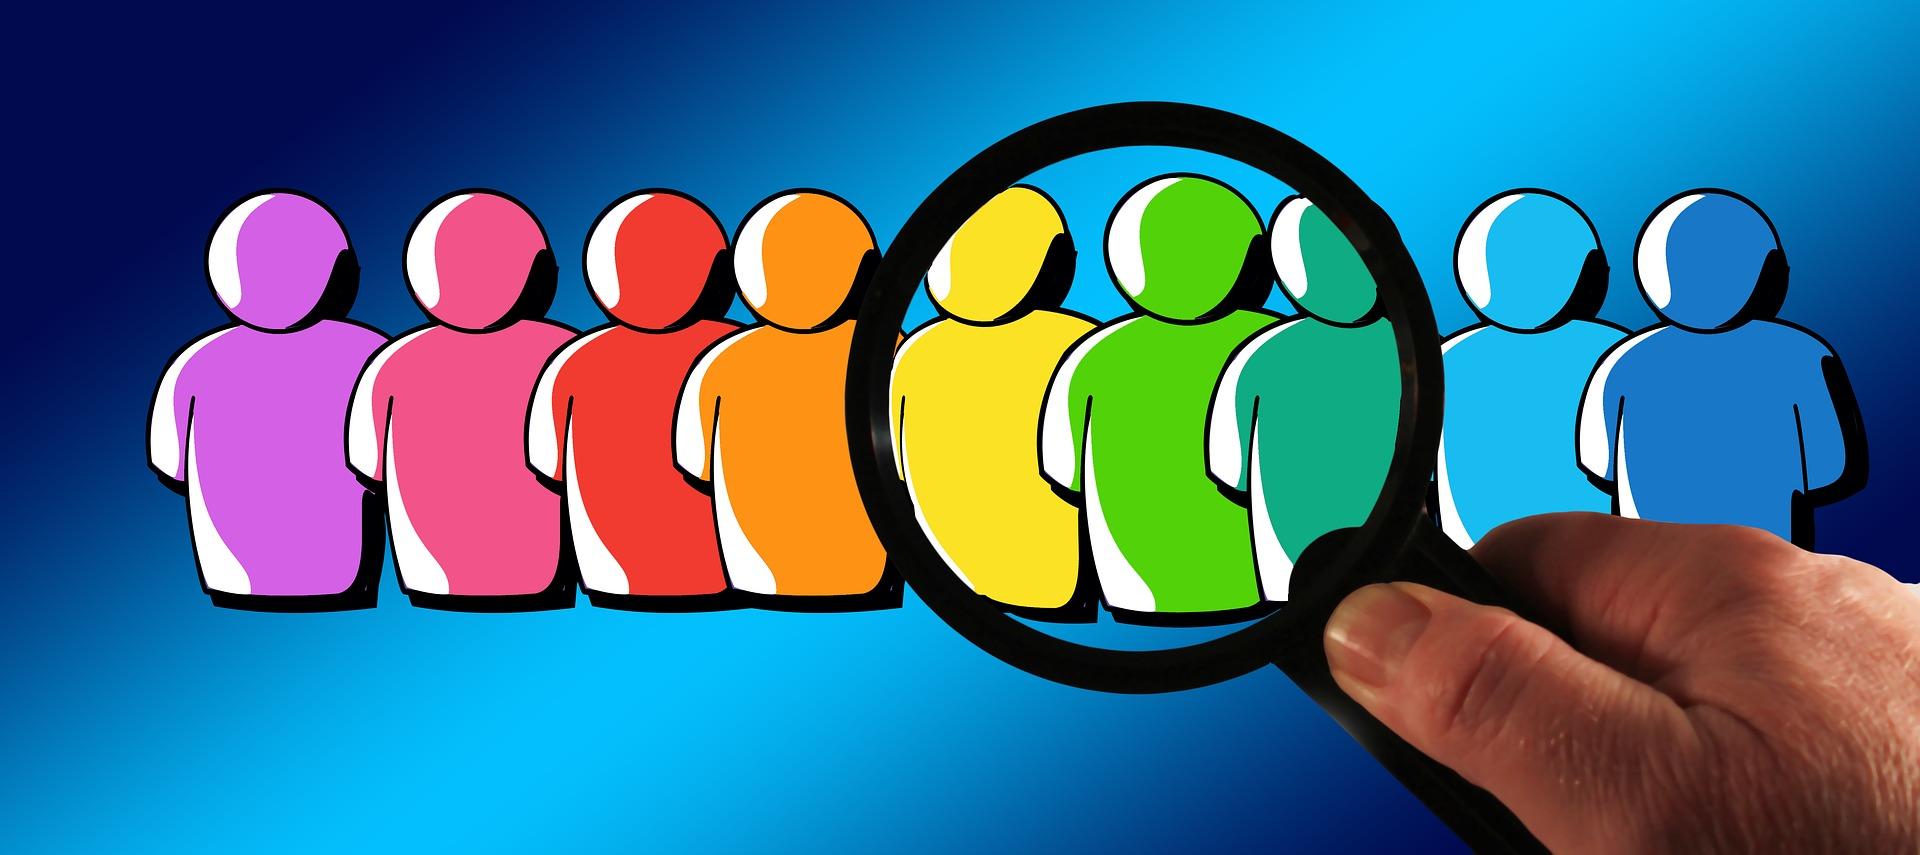 customer based segmentation